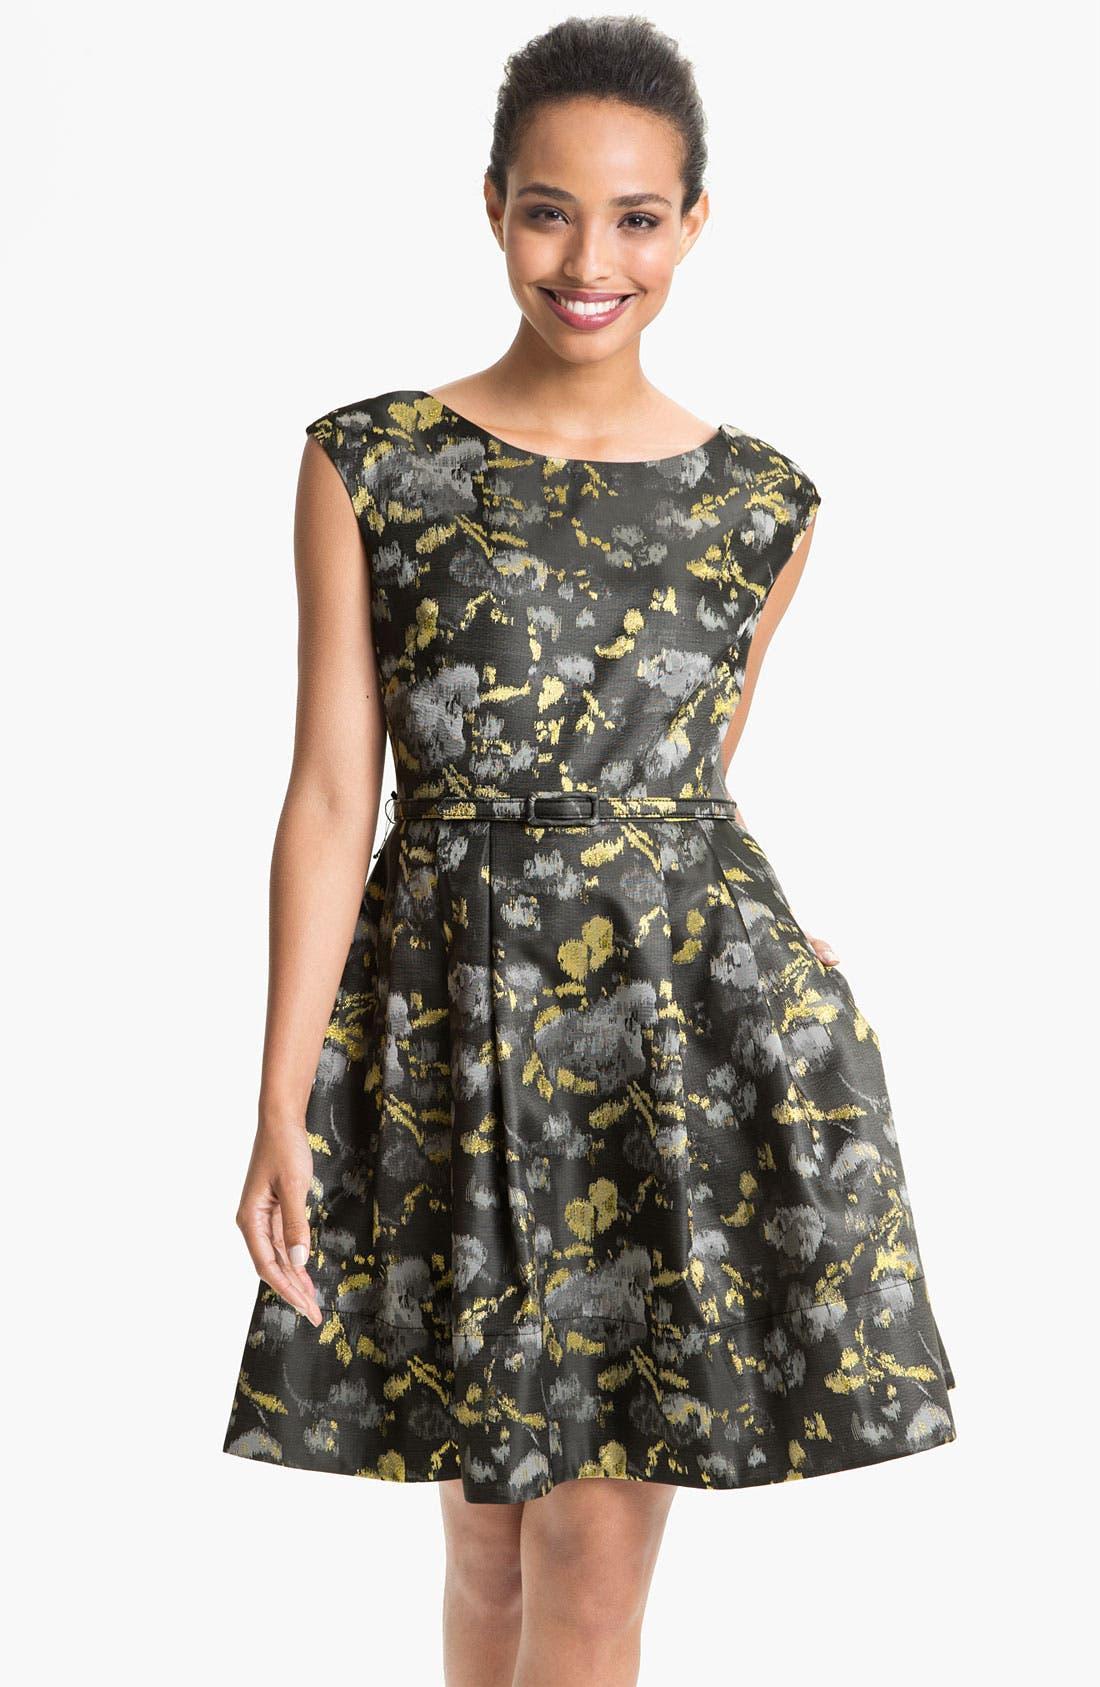 Alternate Image 1 Selected - Eliza J Cap Sleeve Jacquard Fit & Flare Dress (Petite)